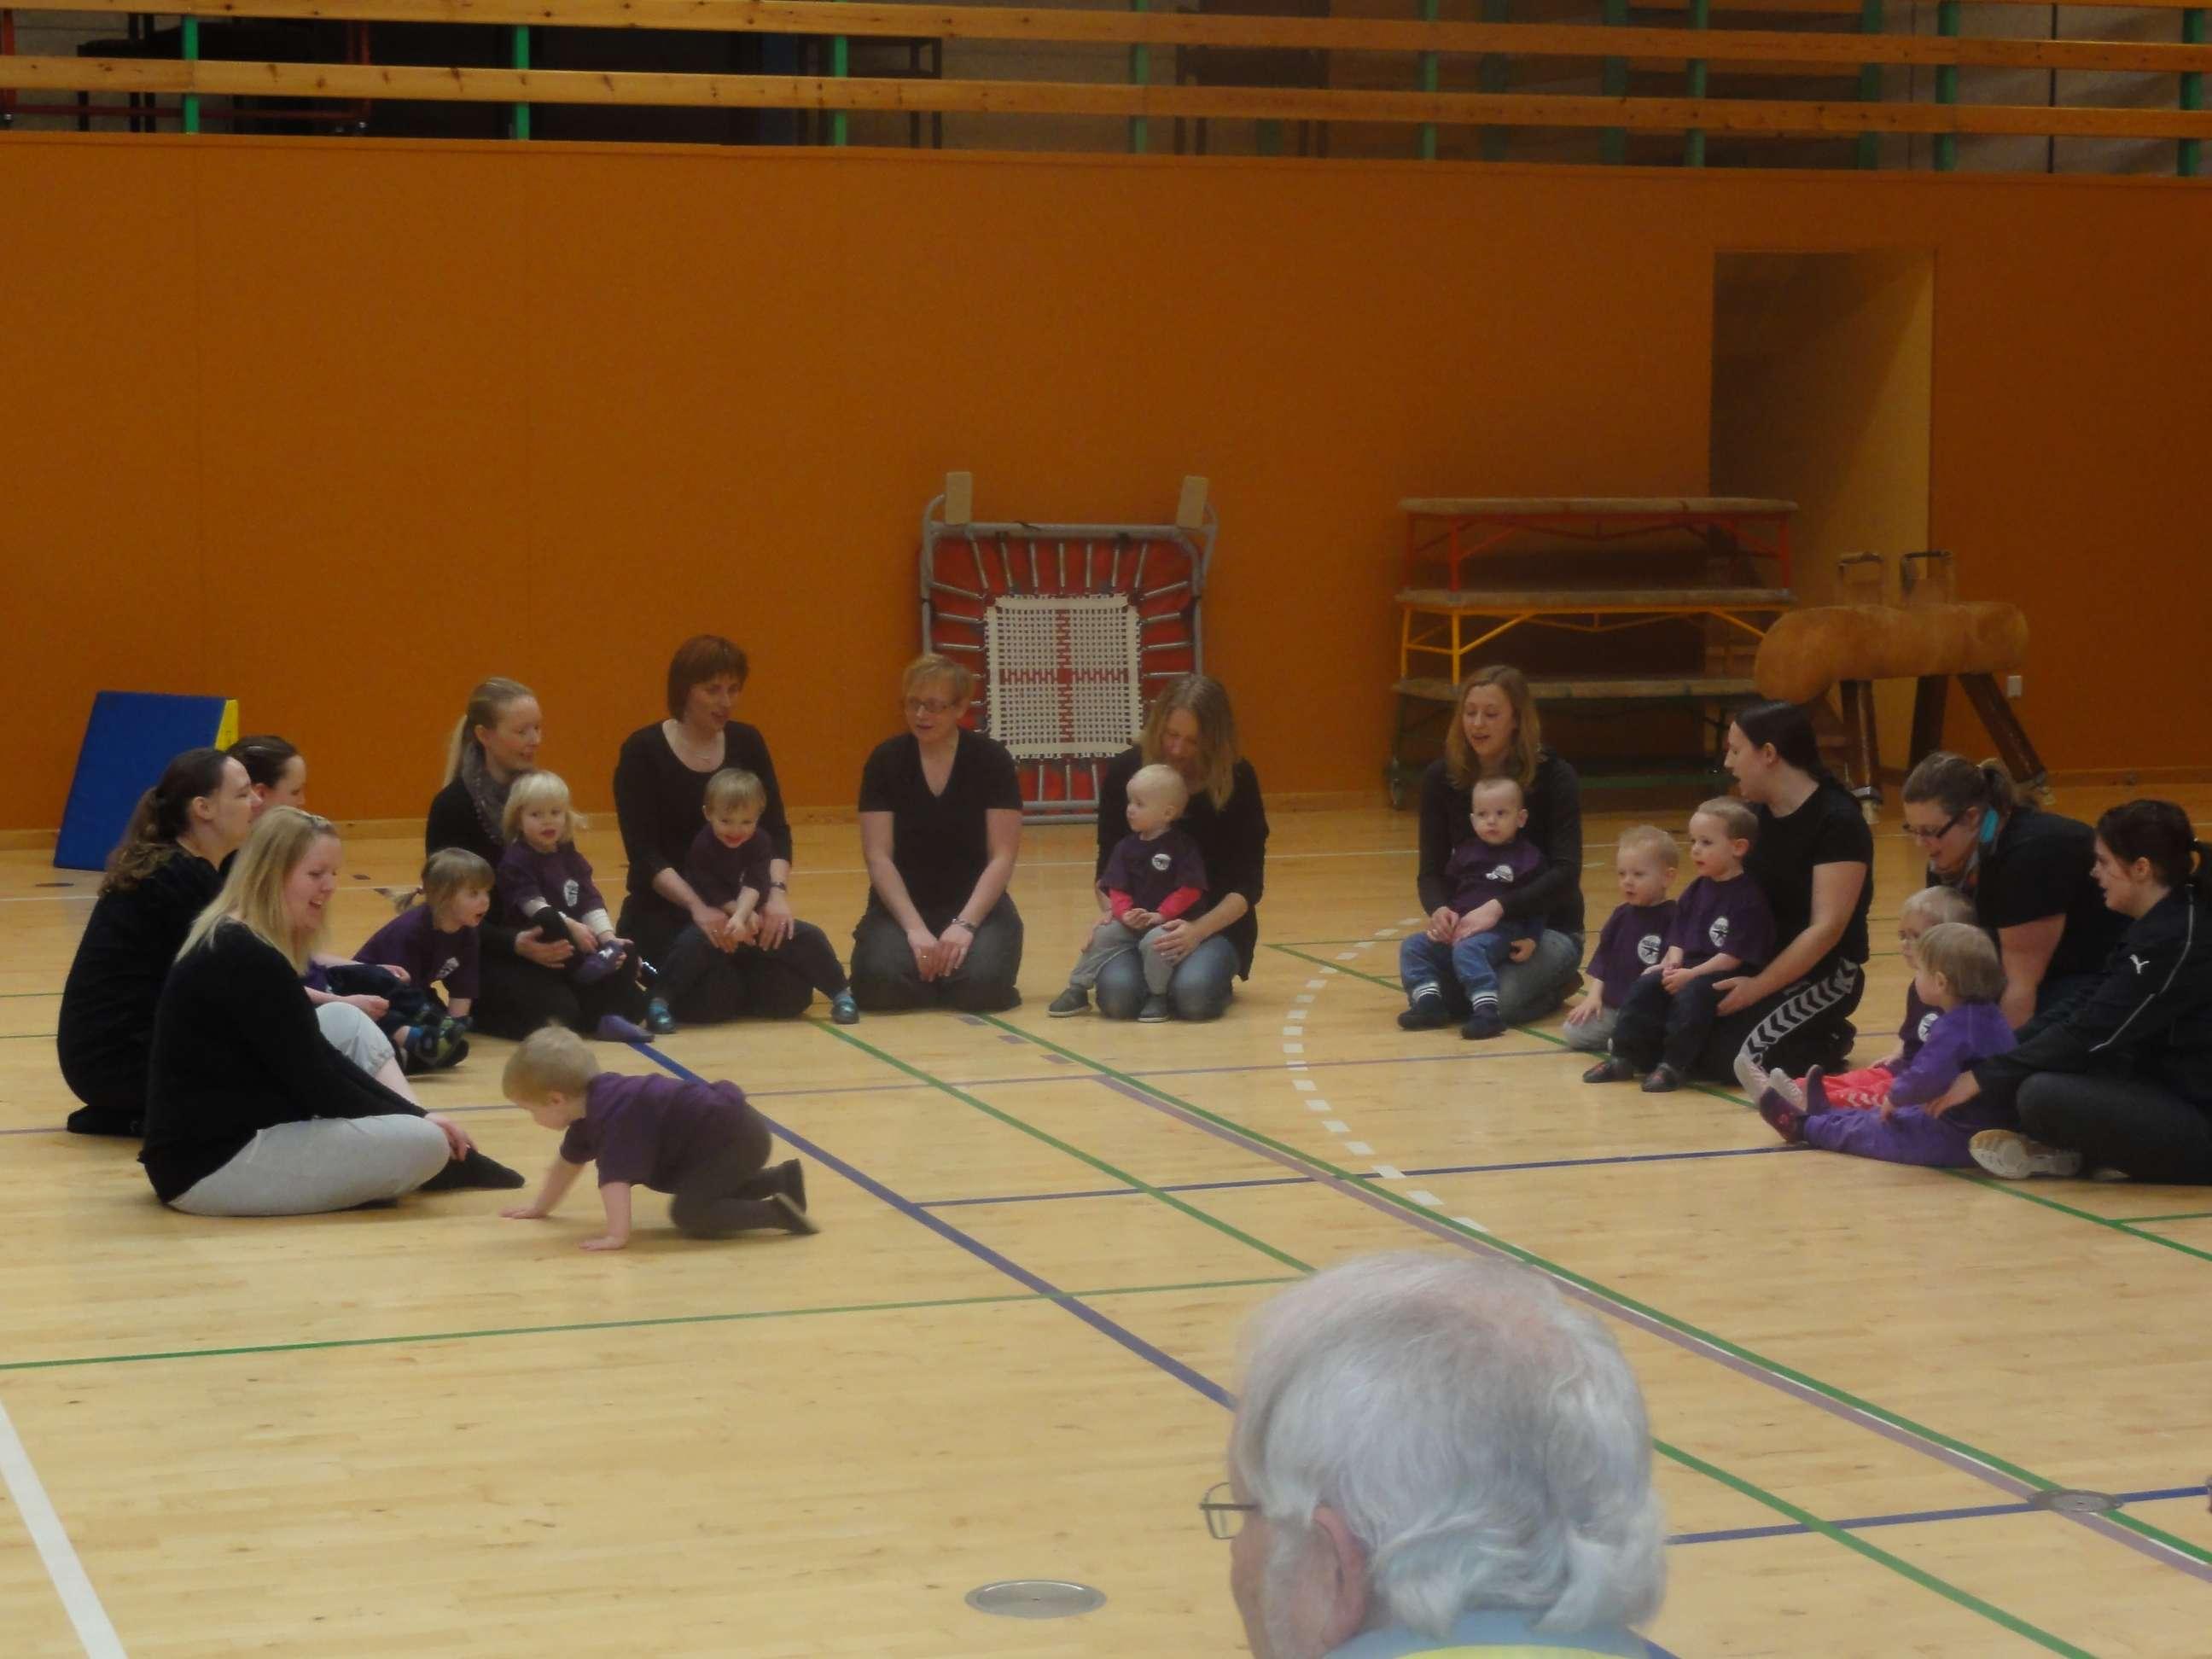 gymnastikopvisning-066